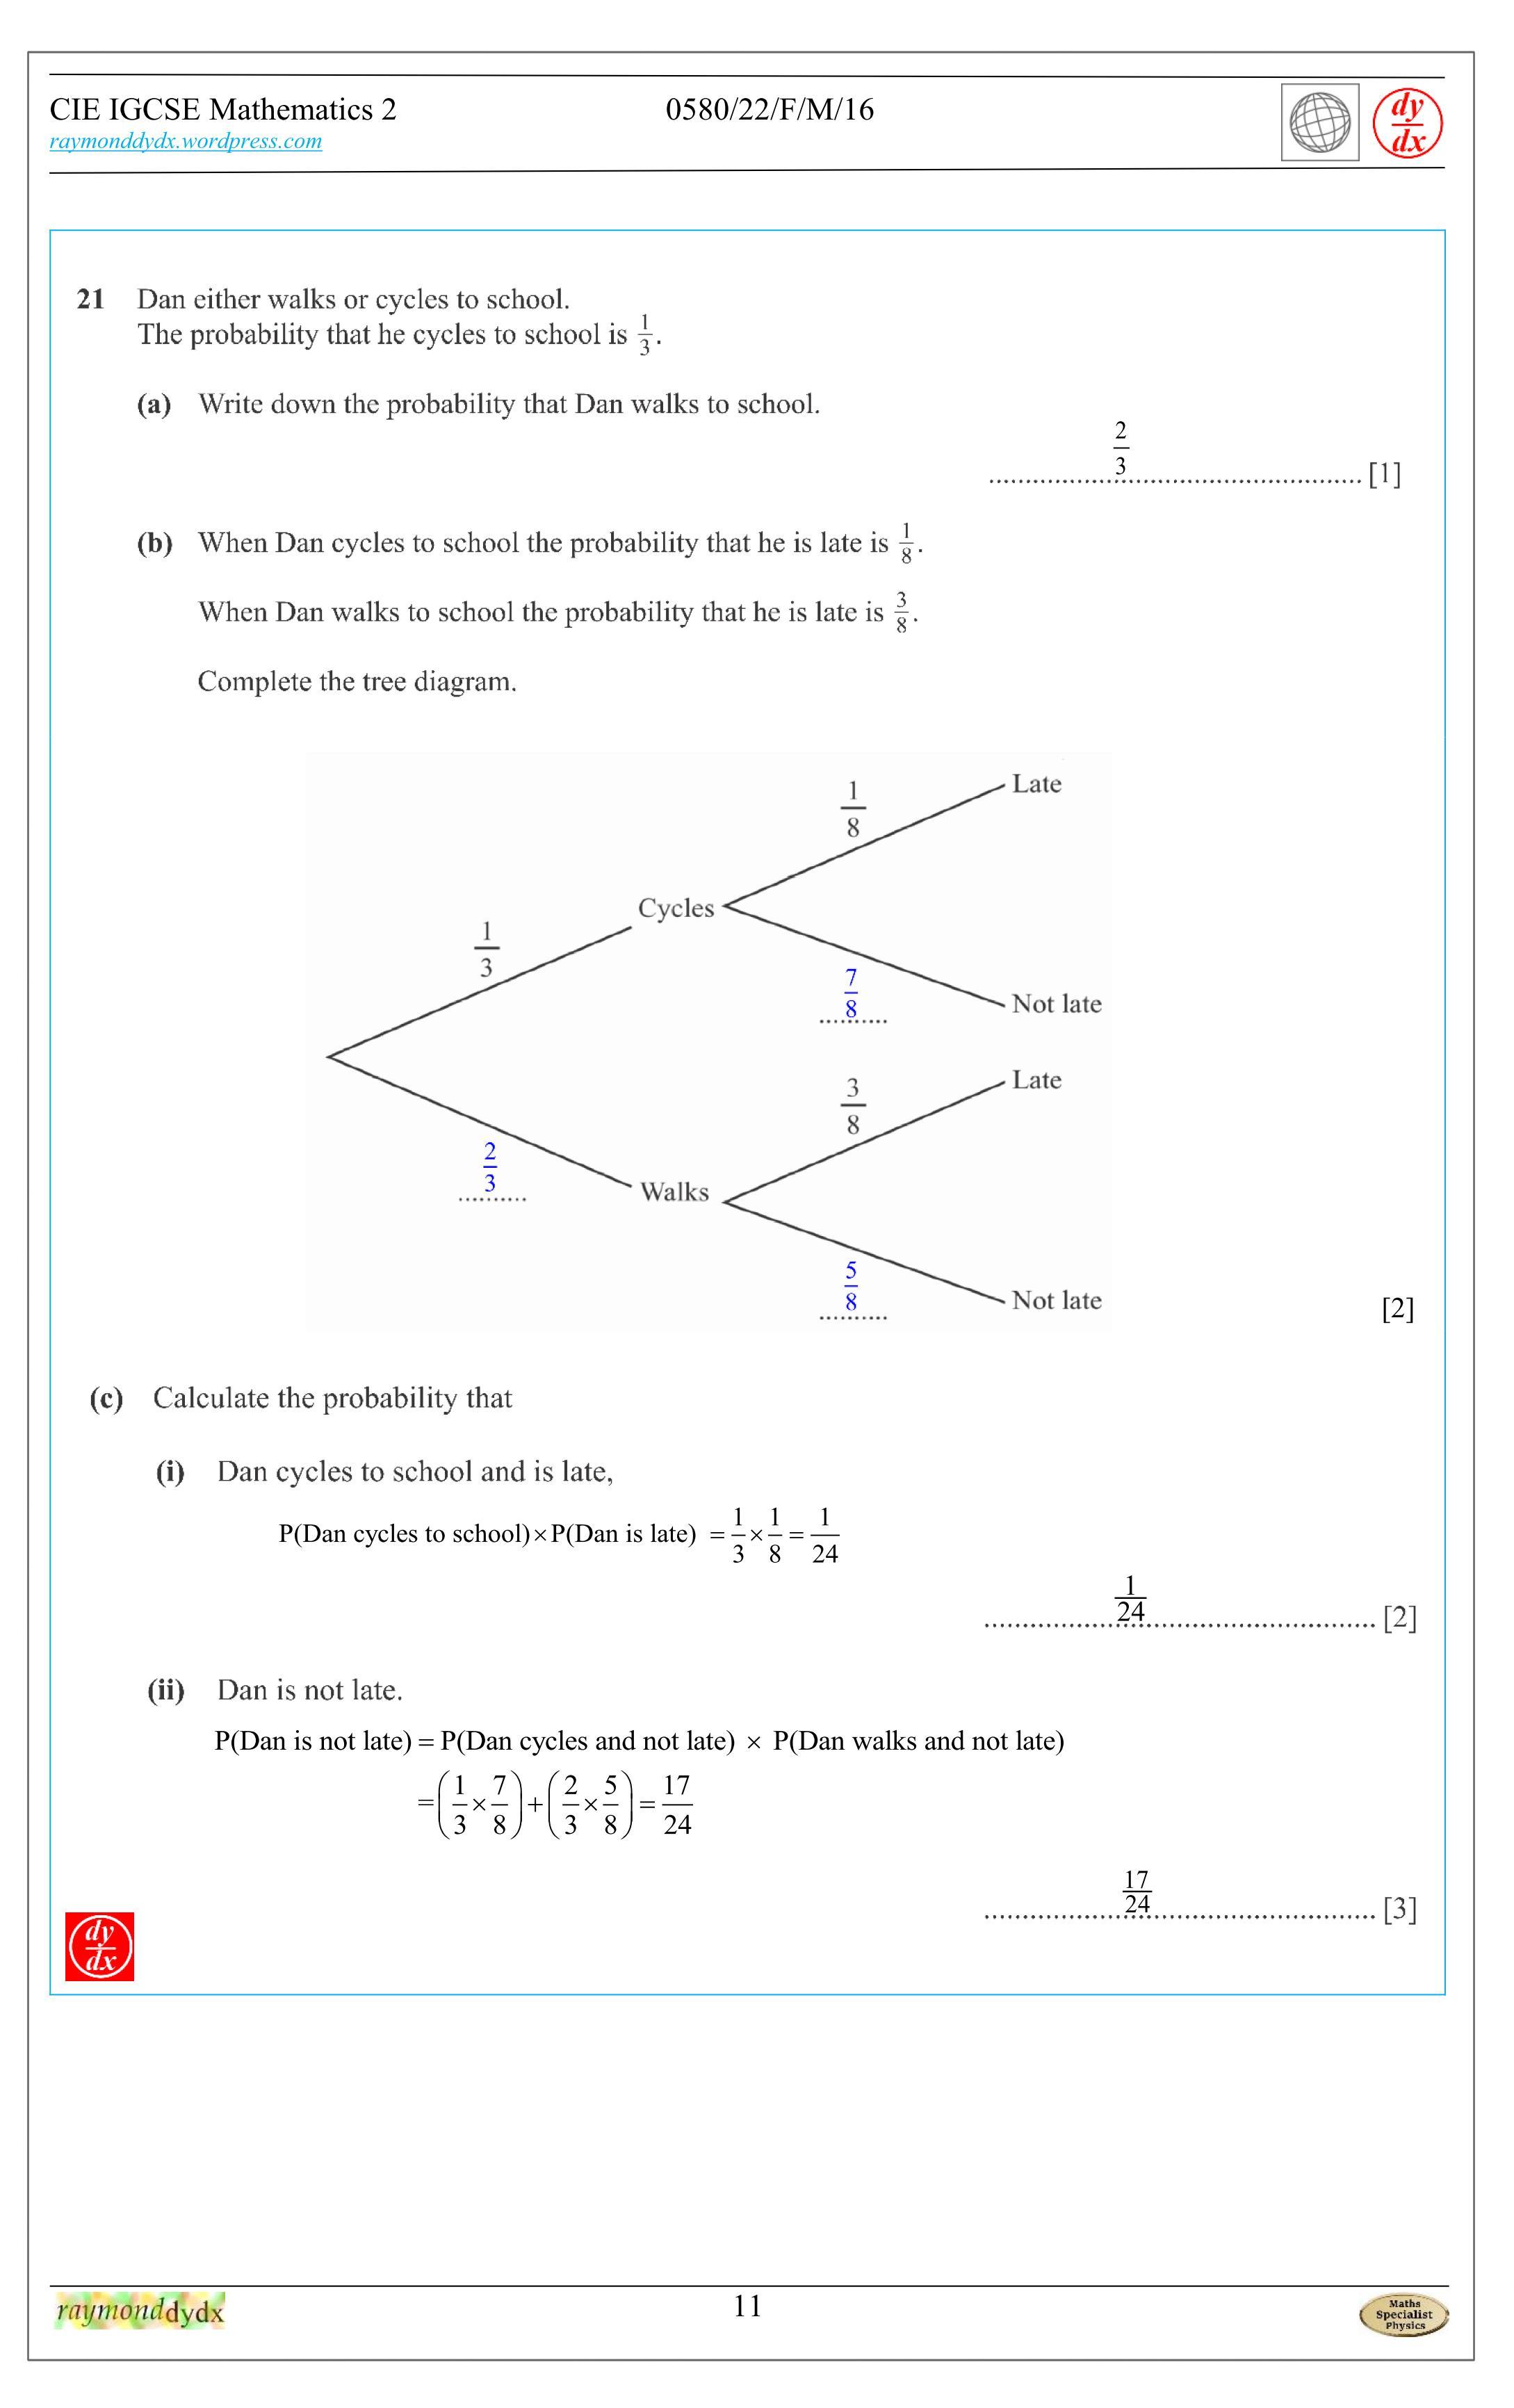 Tuition Maths IGCSE– 0580_m16_qp_22, 0580/22/F/M/16 q21